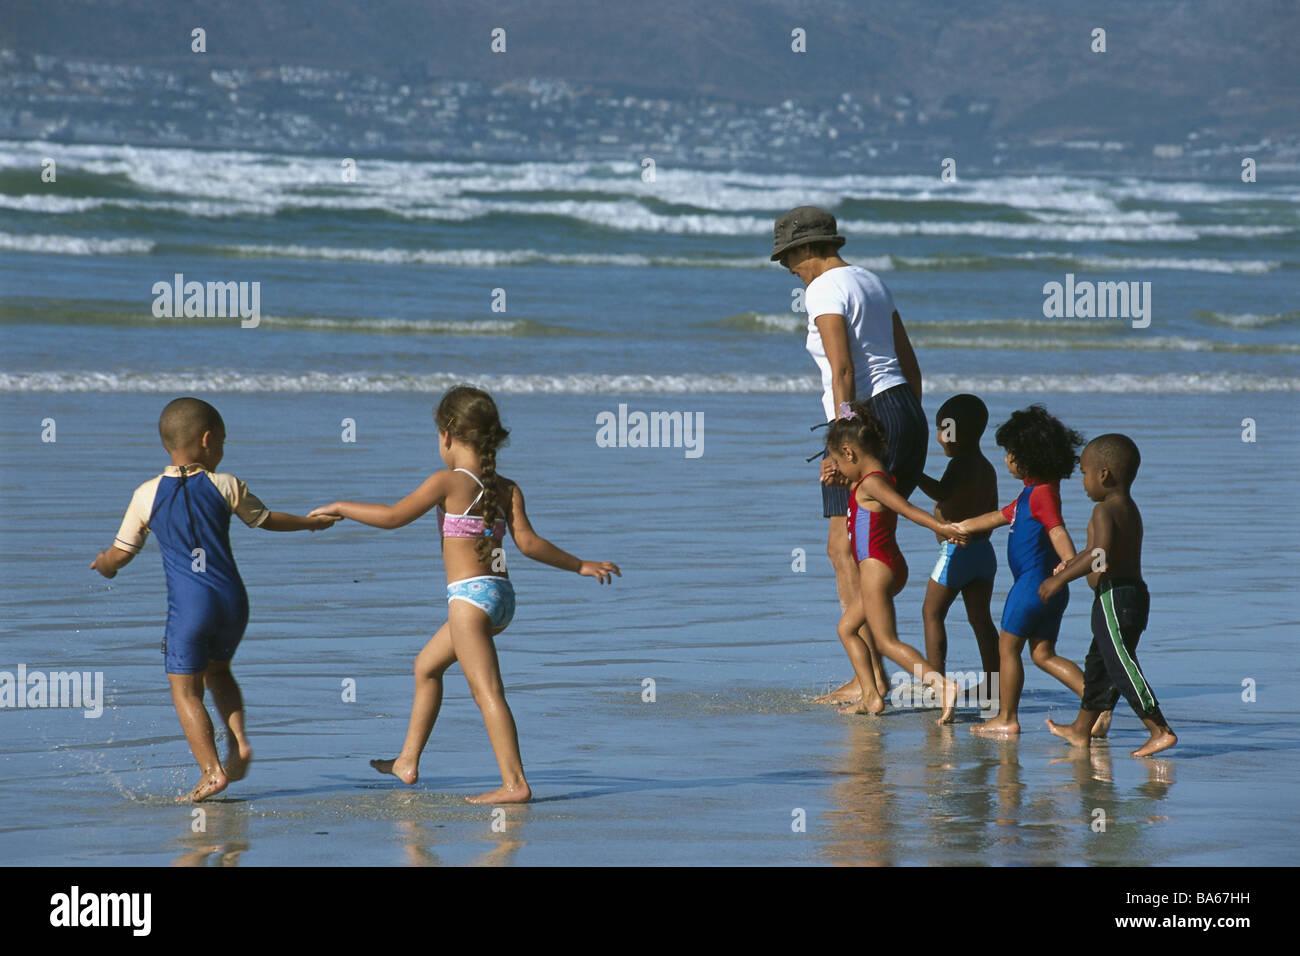 South Africa cape-peninsula False Bay Muizenberg beach senior children bath-clothing sea no models release Africa - Stock Image